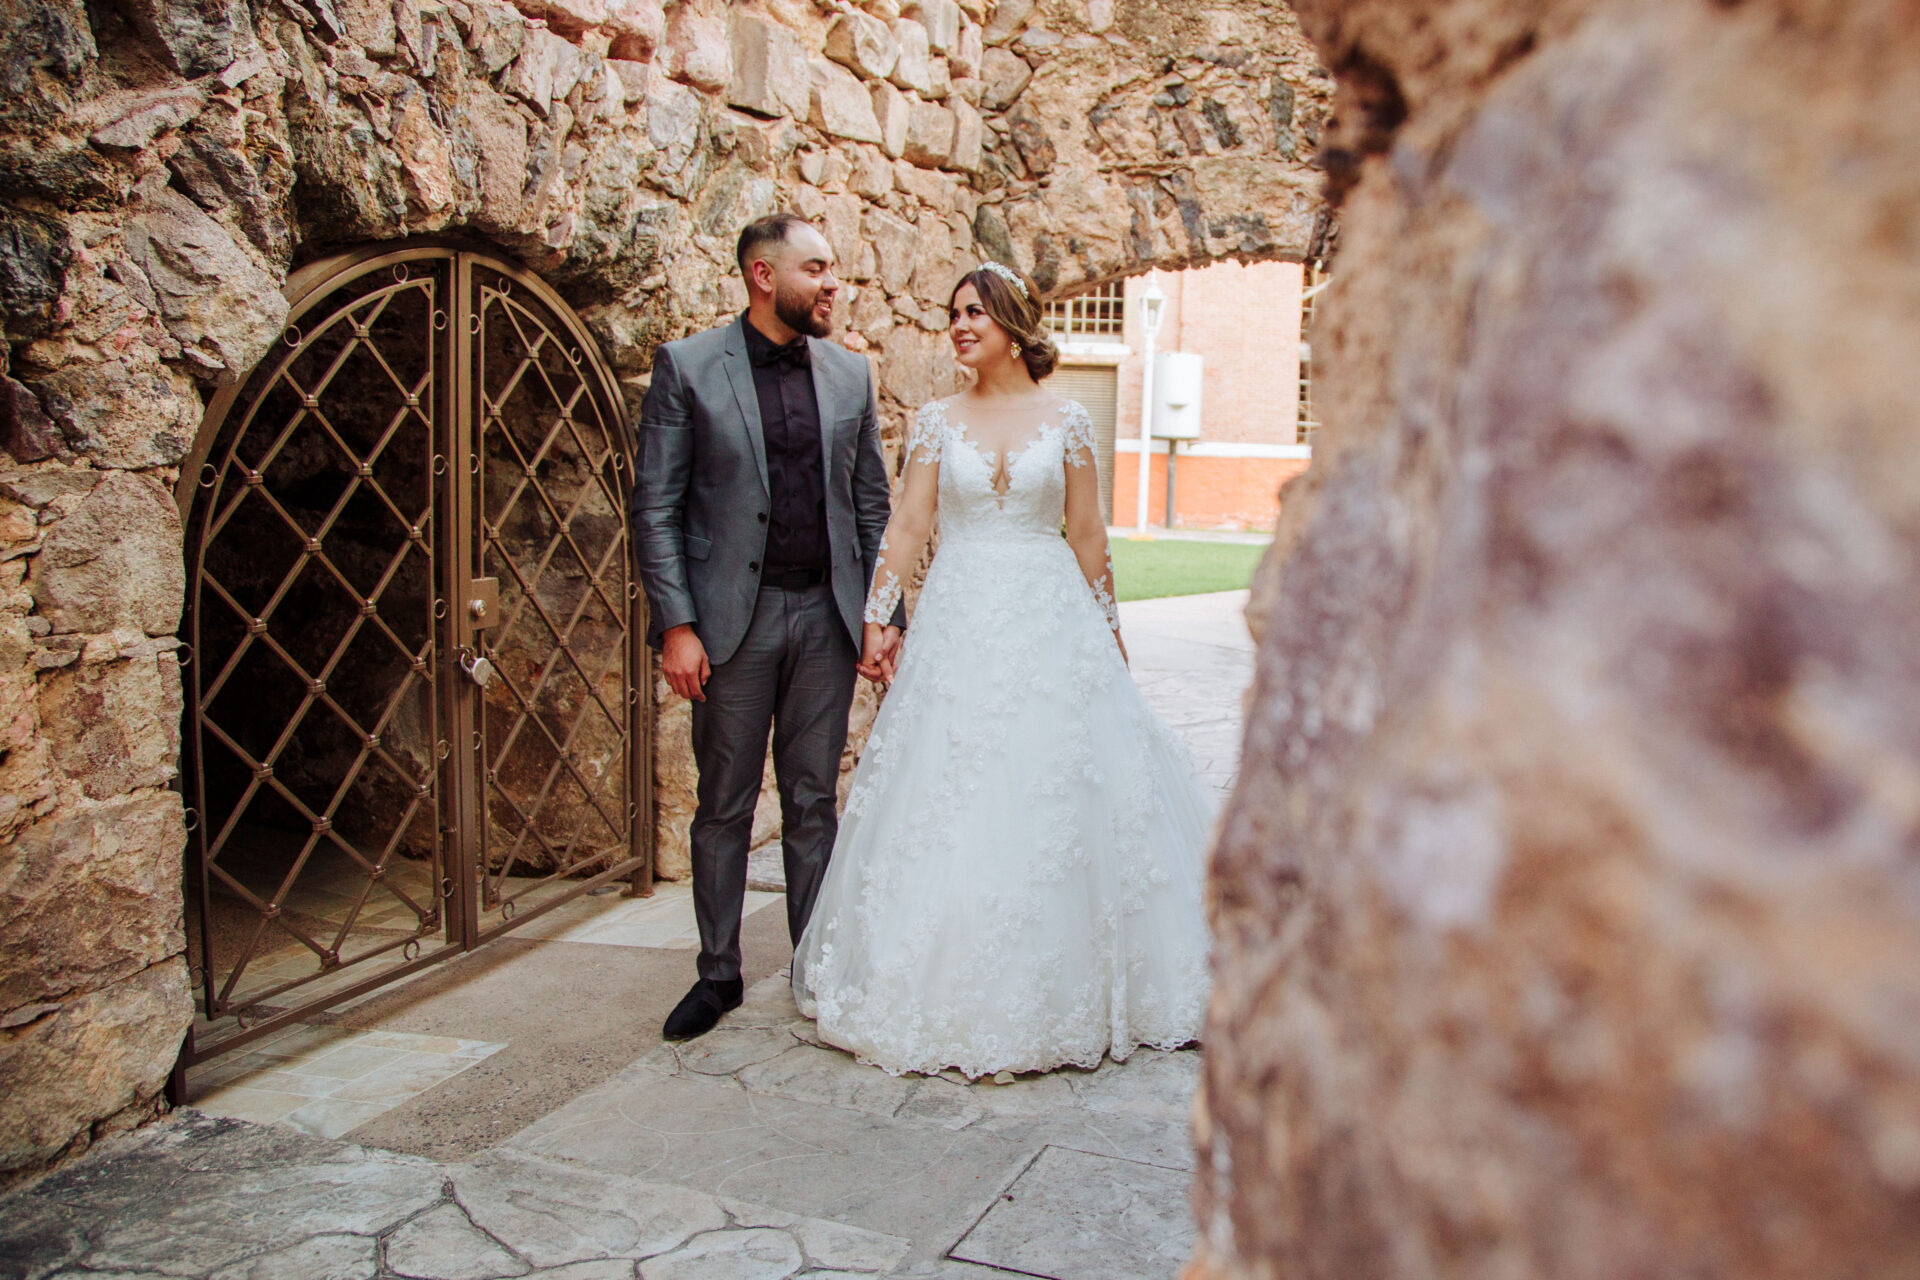 javier_noriega_fotografo_bodas_zacatecas_fresnillo_chihuahua_wedding_photographer13